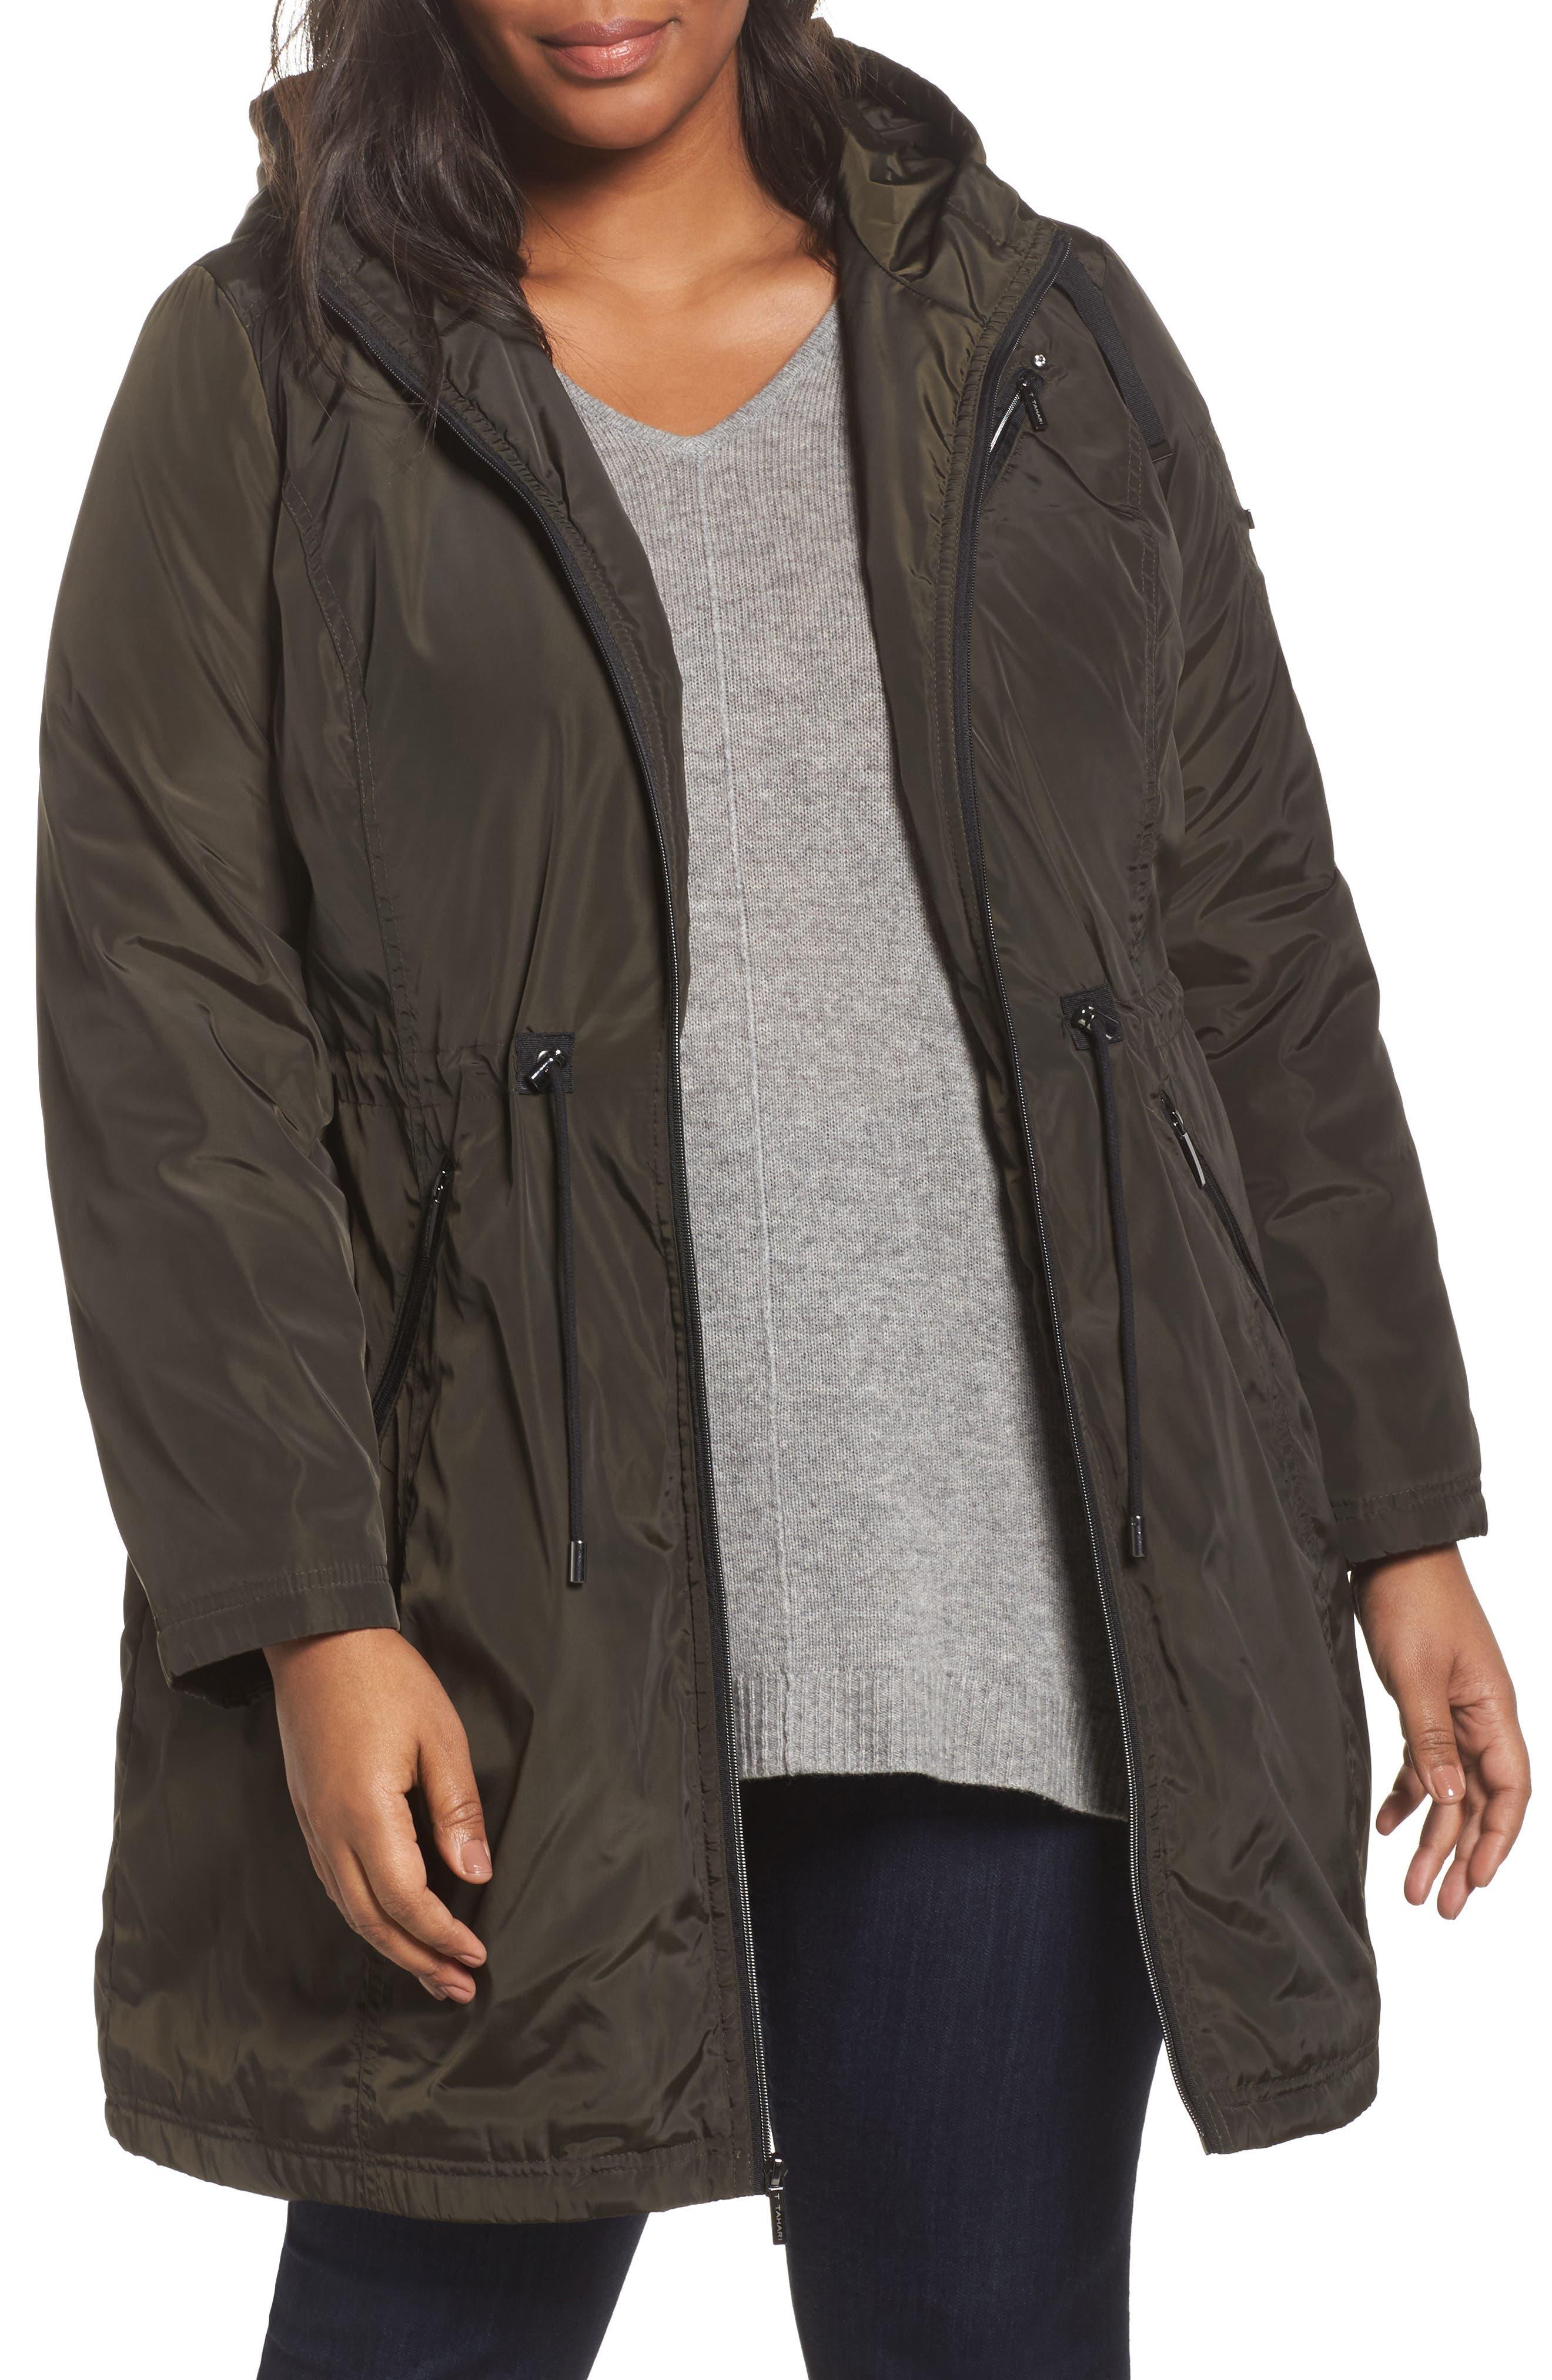 Tiffany Raincoat,                             Main thumbnail 3, color,